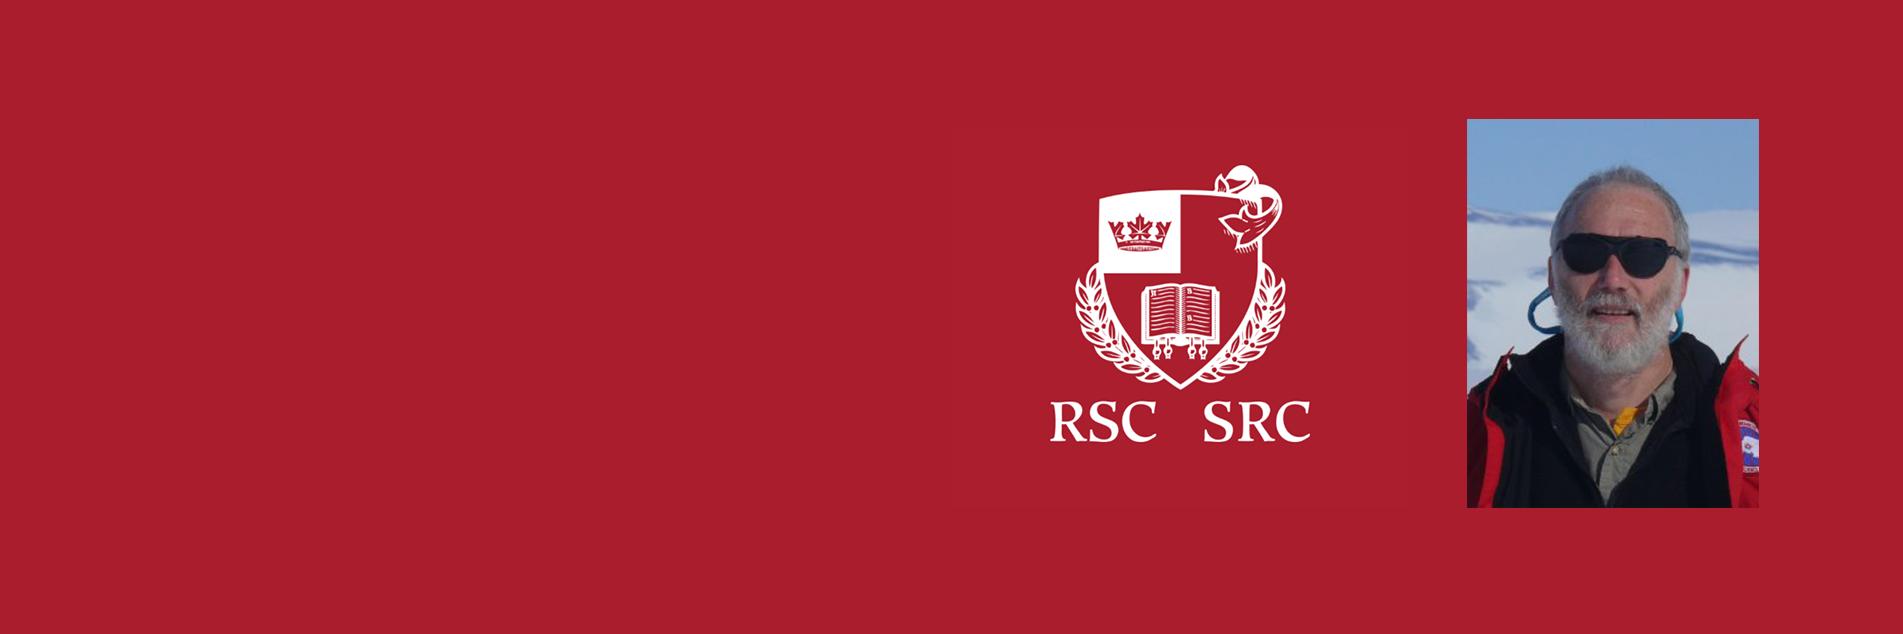 Dr Mark Halpern and the Royal Society of Canada shield